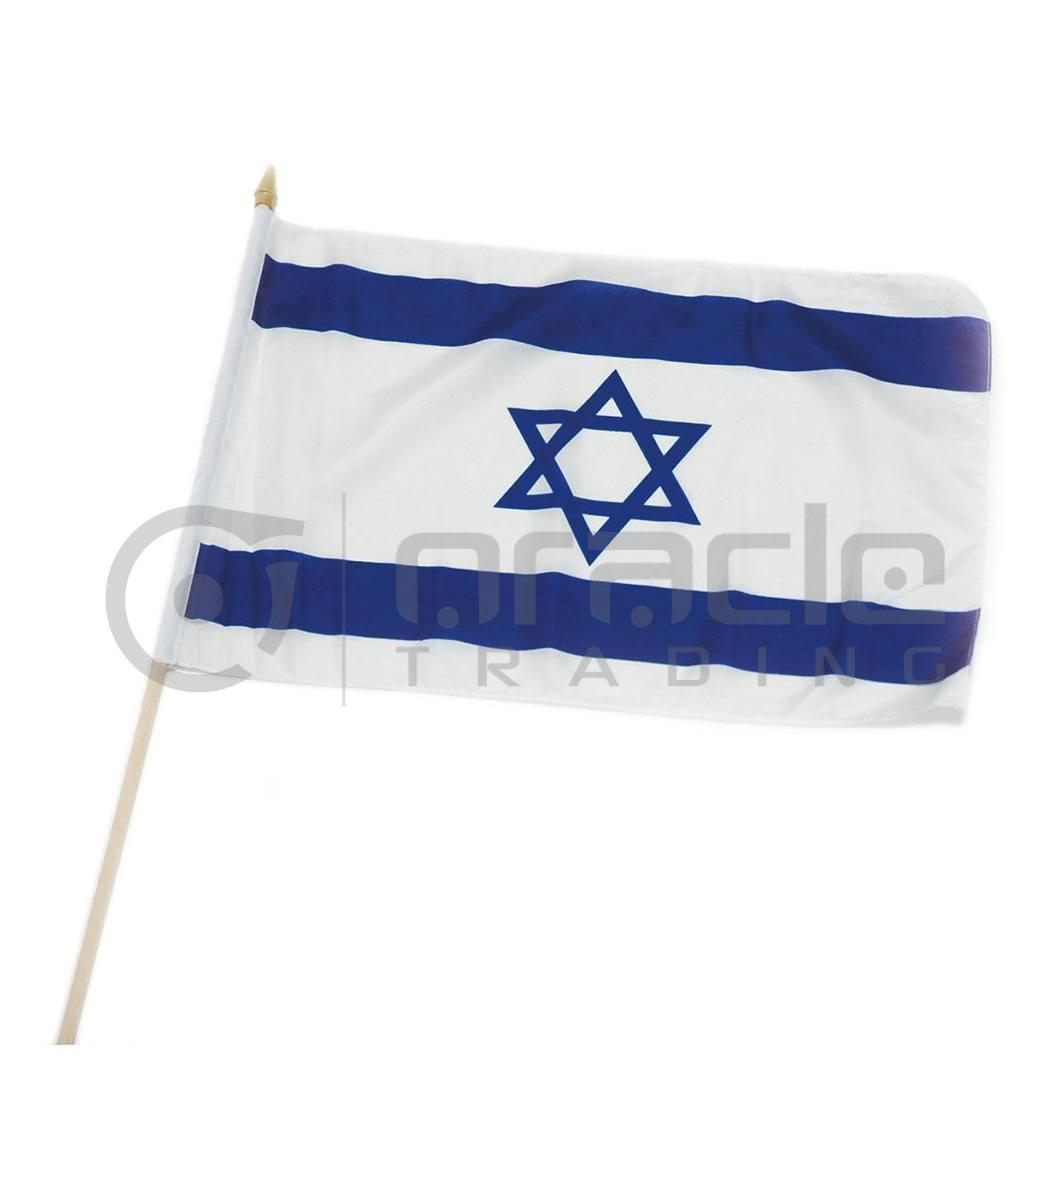 "Israel Large Stick Flag - 12""x18"" - 12-Pack"